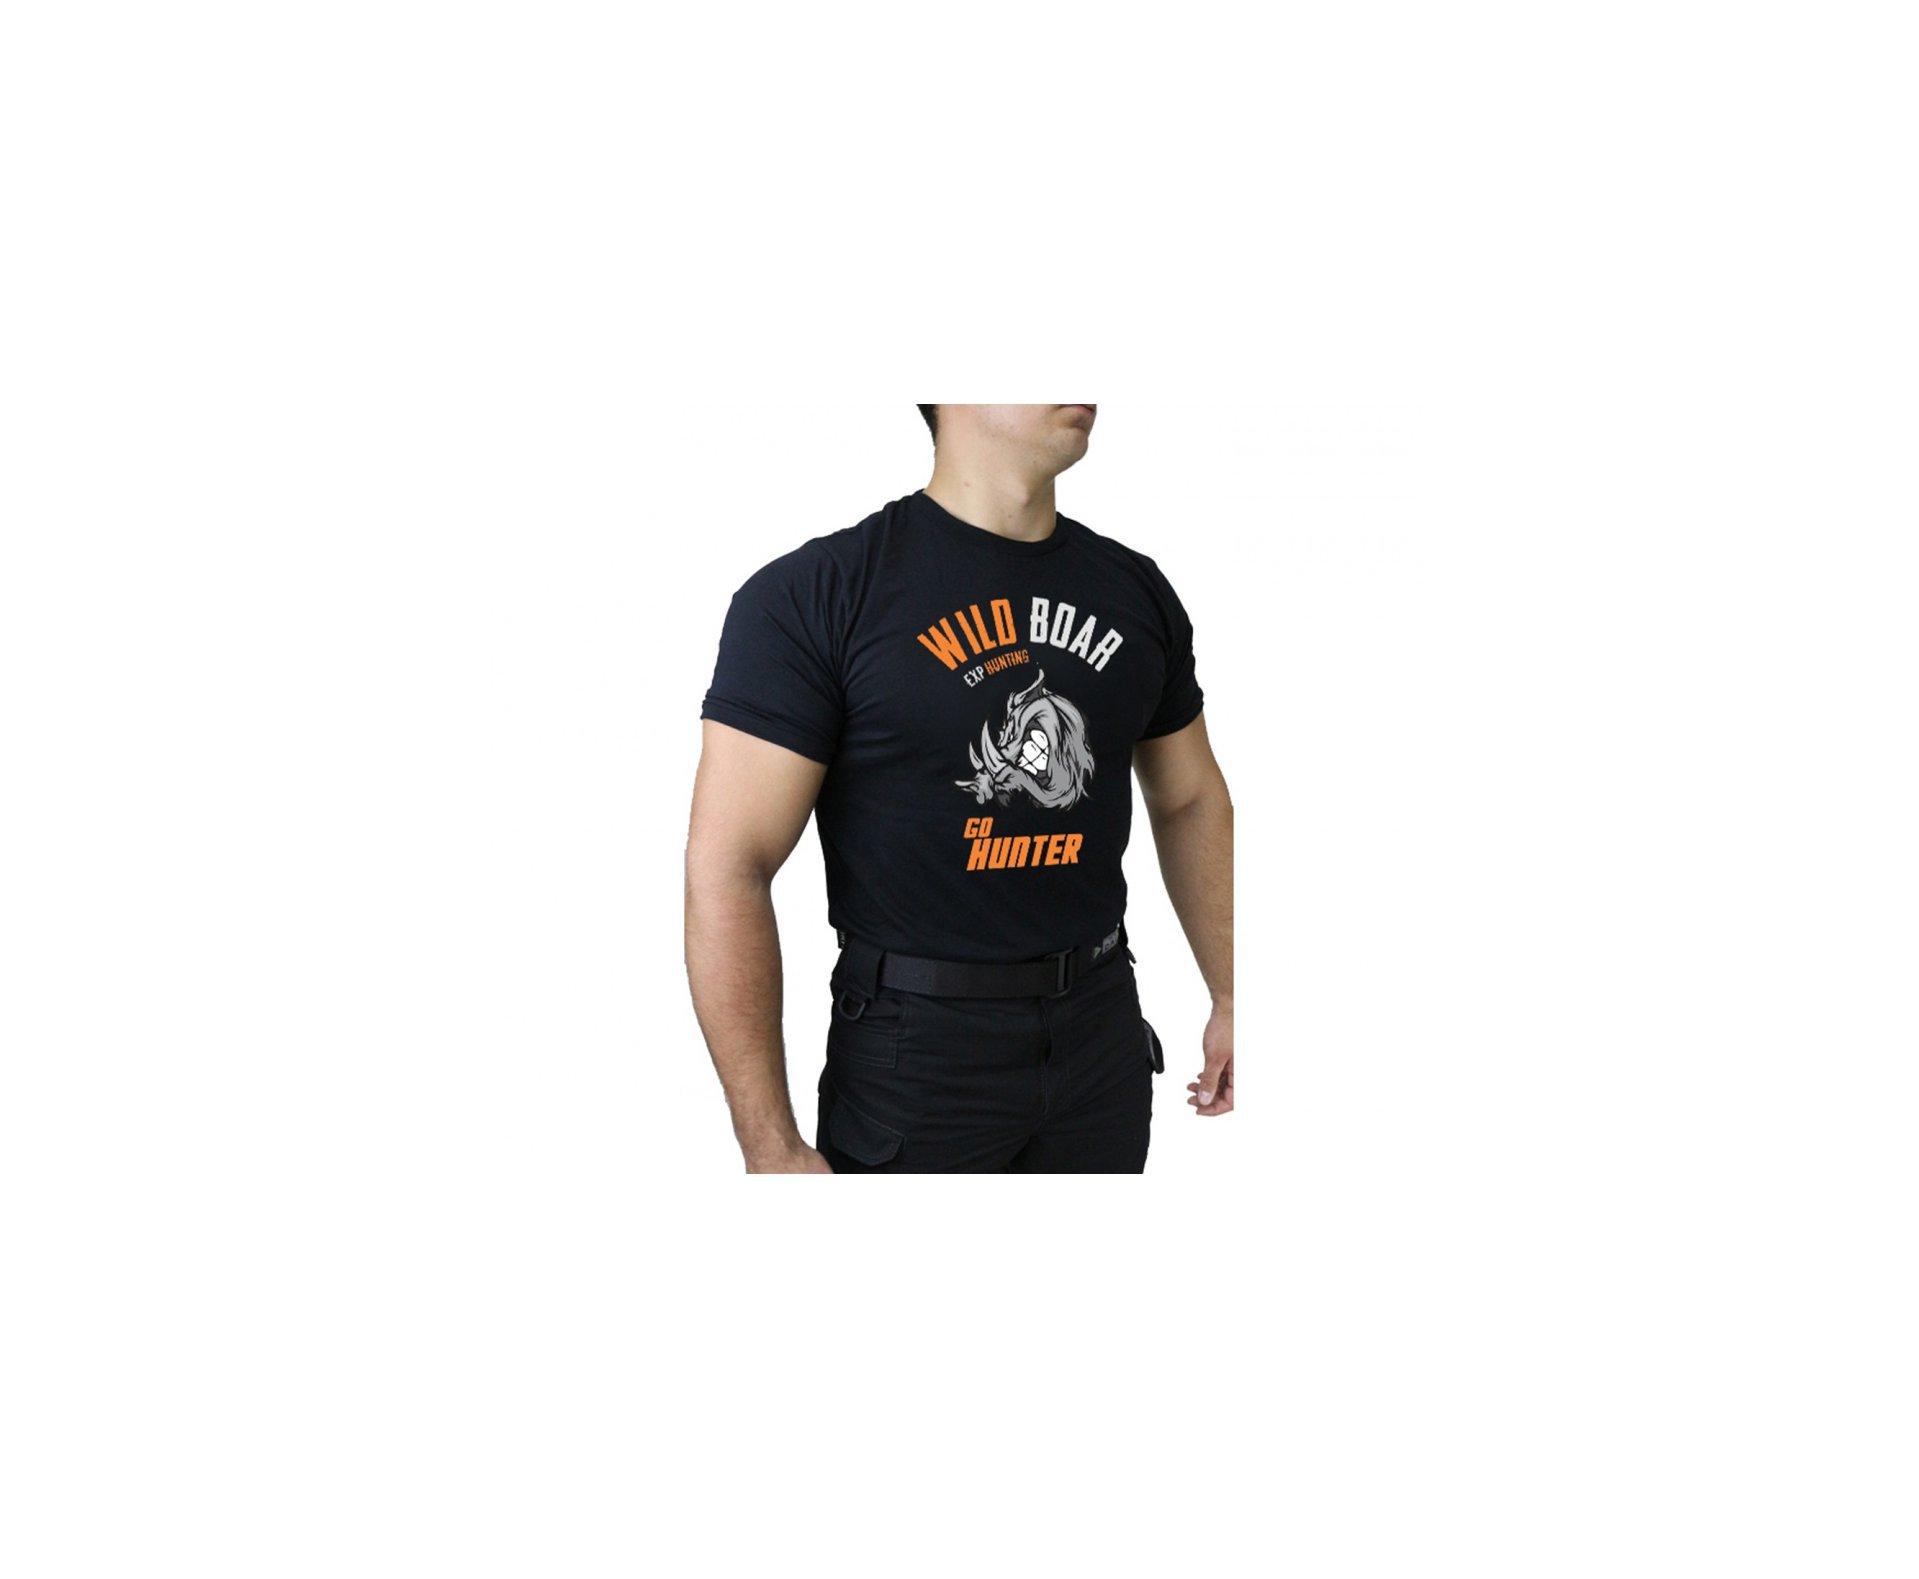 Camiseta Temática Hunting - 001 - Preto - Dacs